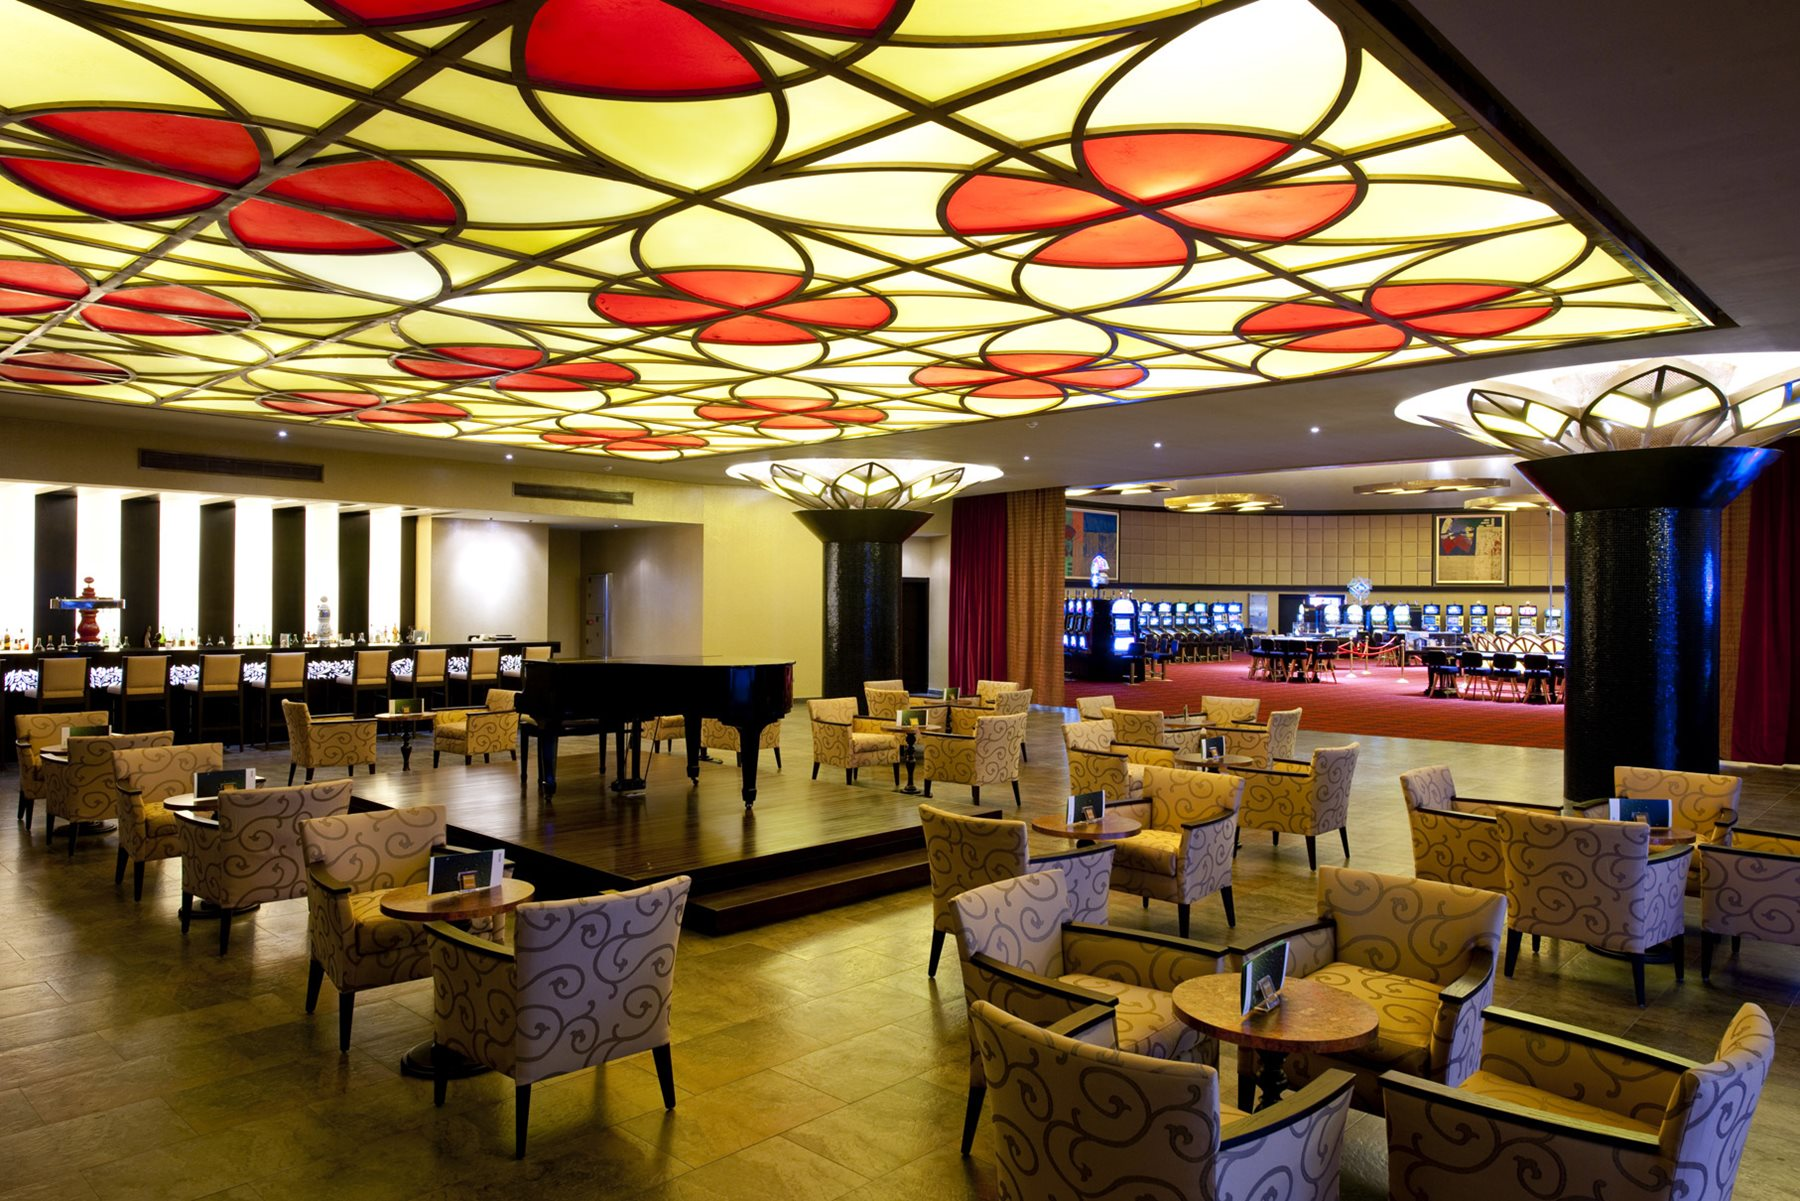 PUJ_BarcBavPalaceDlx_Bar_006_CasinoBar